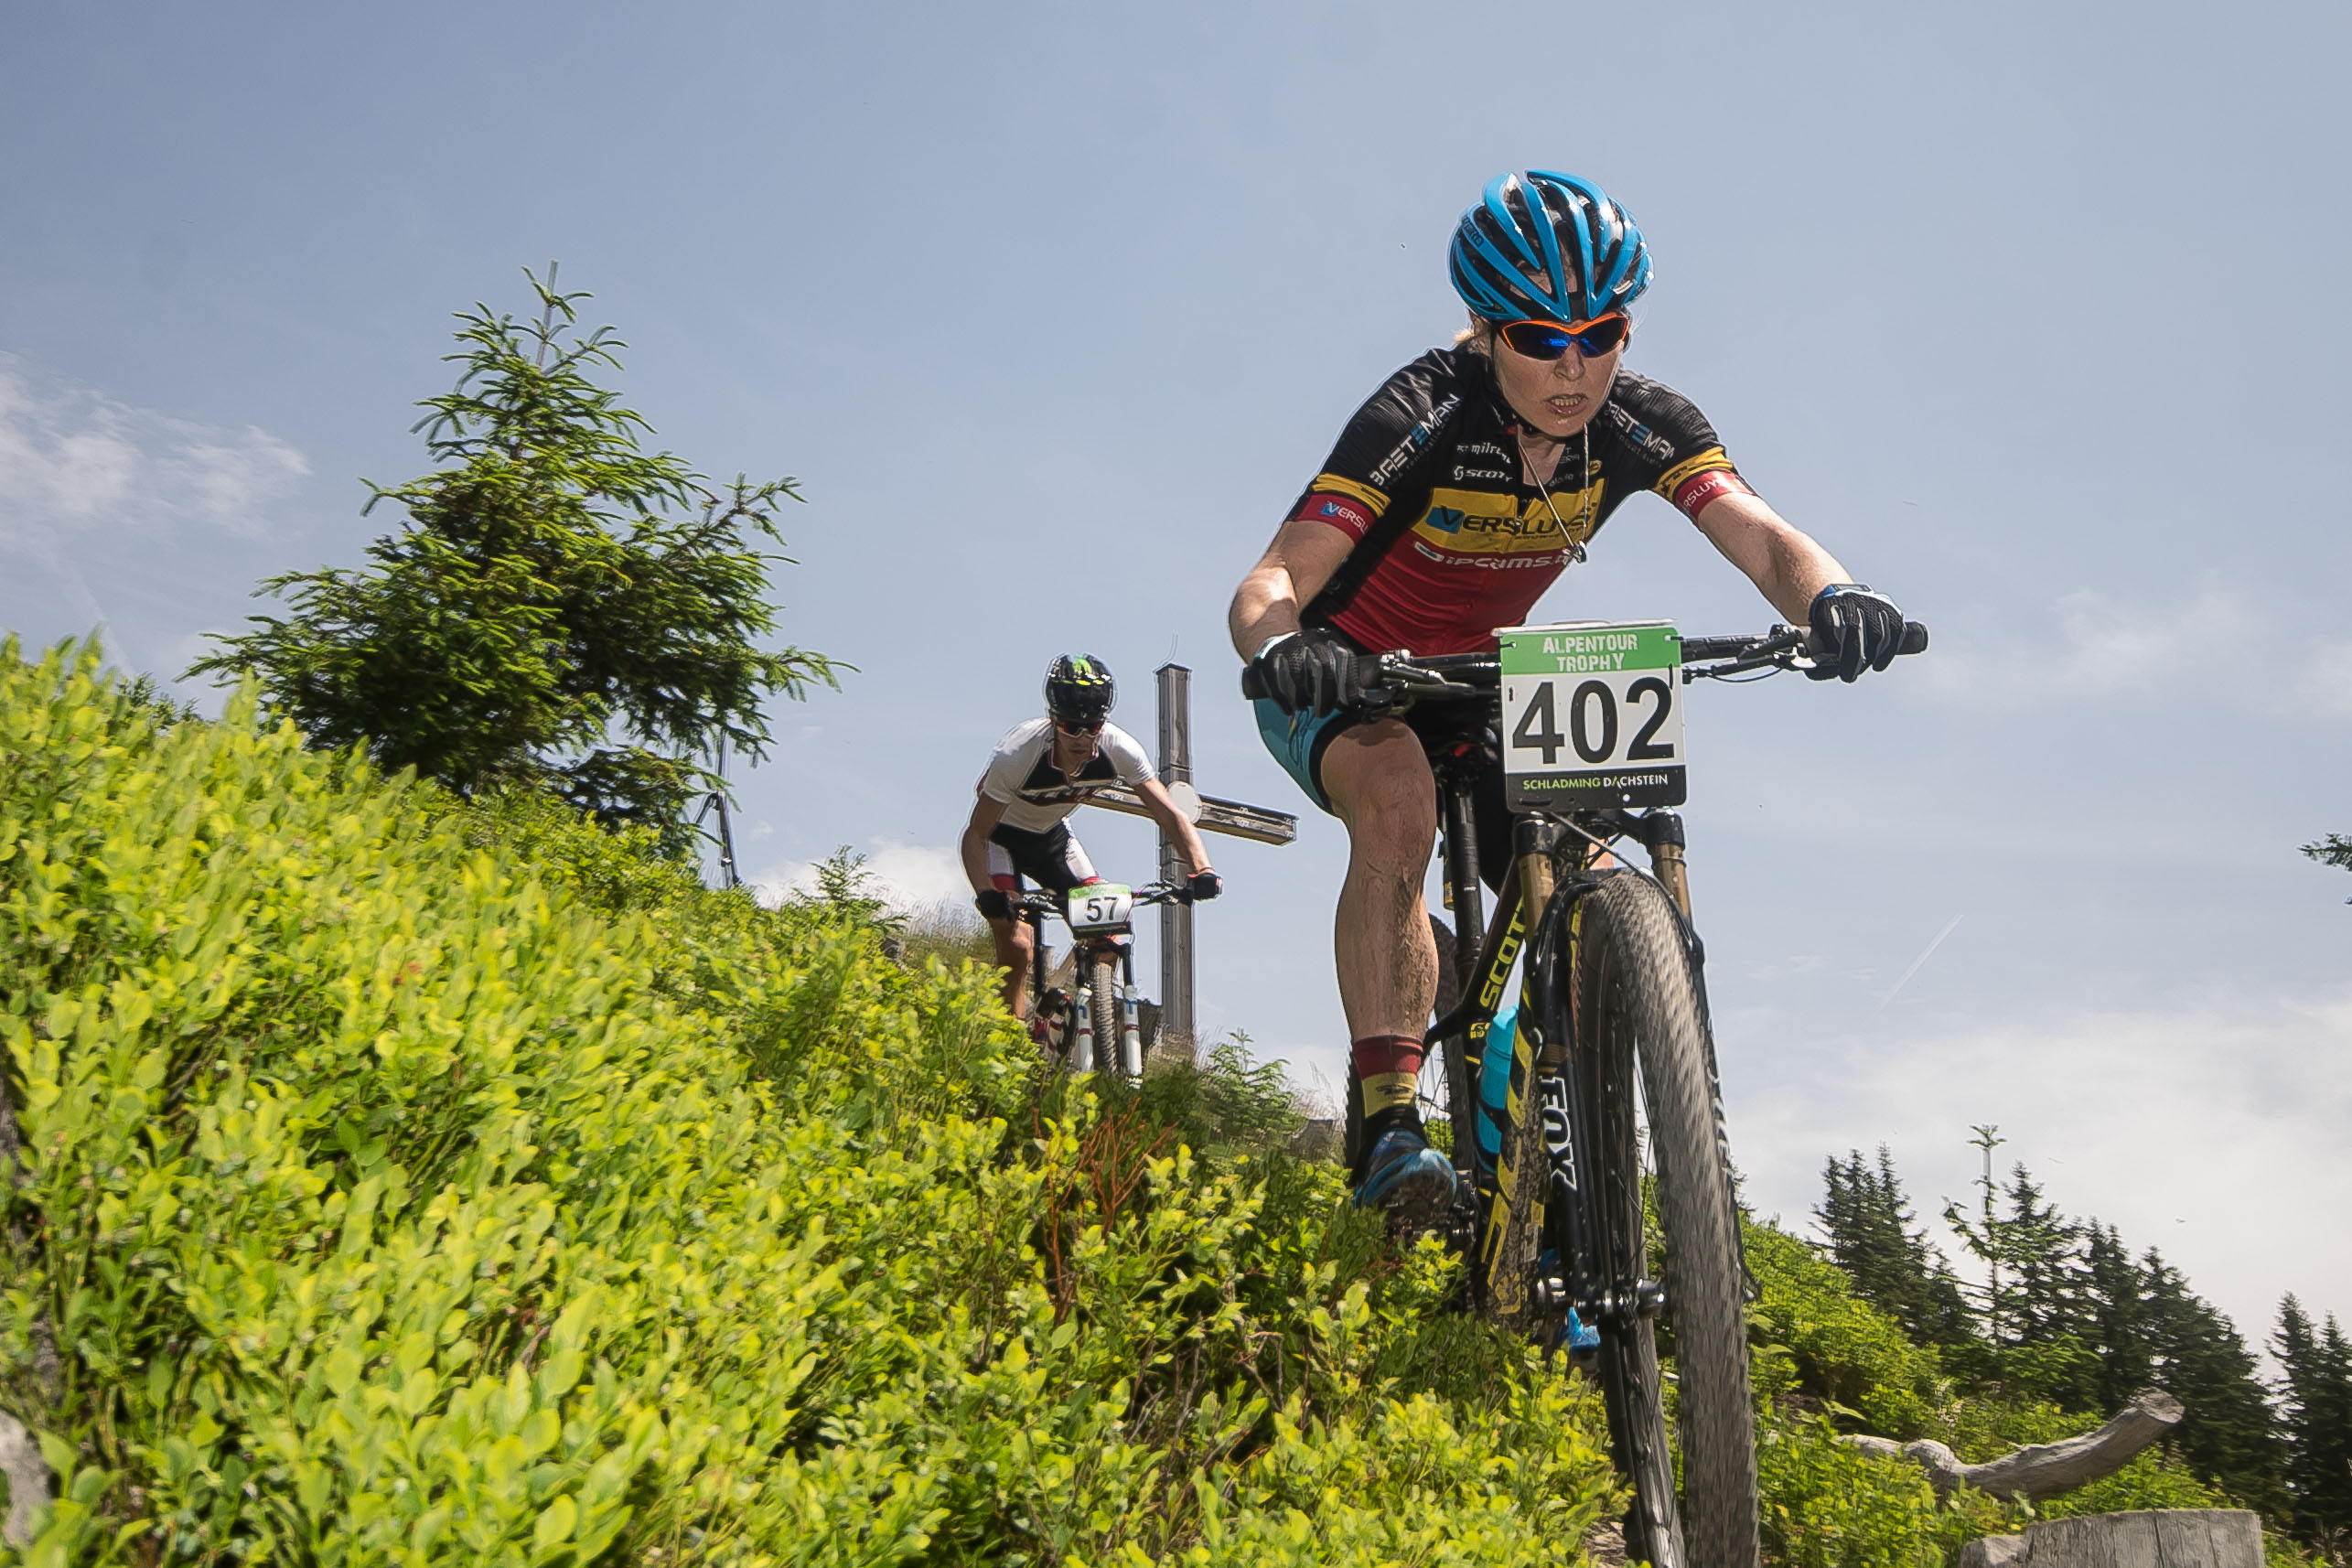 Githa Michiels derde in Alpentour trophy, Lakata wint bij de elite heren.